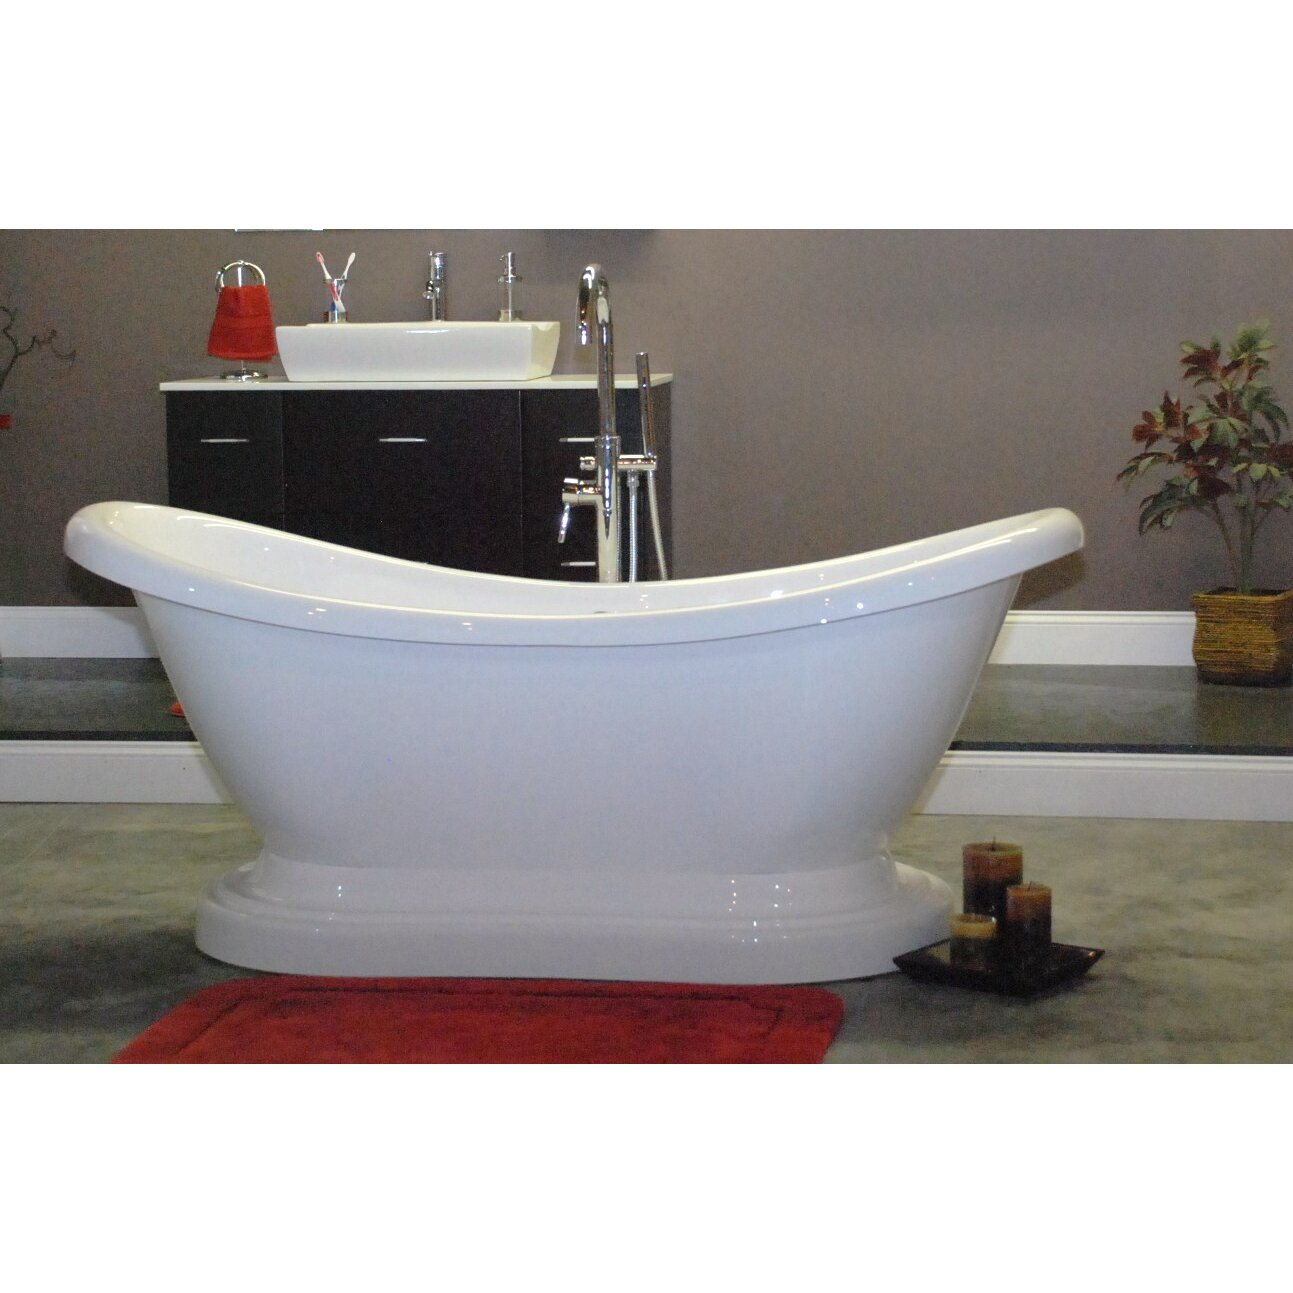 Cambridge Plumbing 6863quot x 29quot Pedestal Slipper Bathtub  : Cambridge Plumbing 6863 x 29 Pedestal Slipper Bathtub from www.wayfair.com size 1293 x 1293 jpeg 233kB